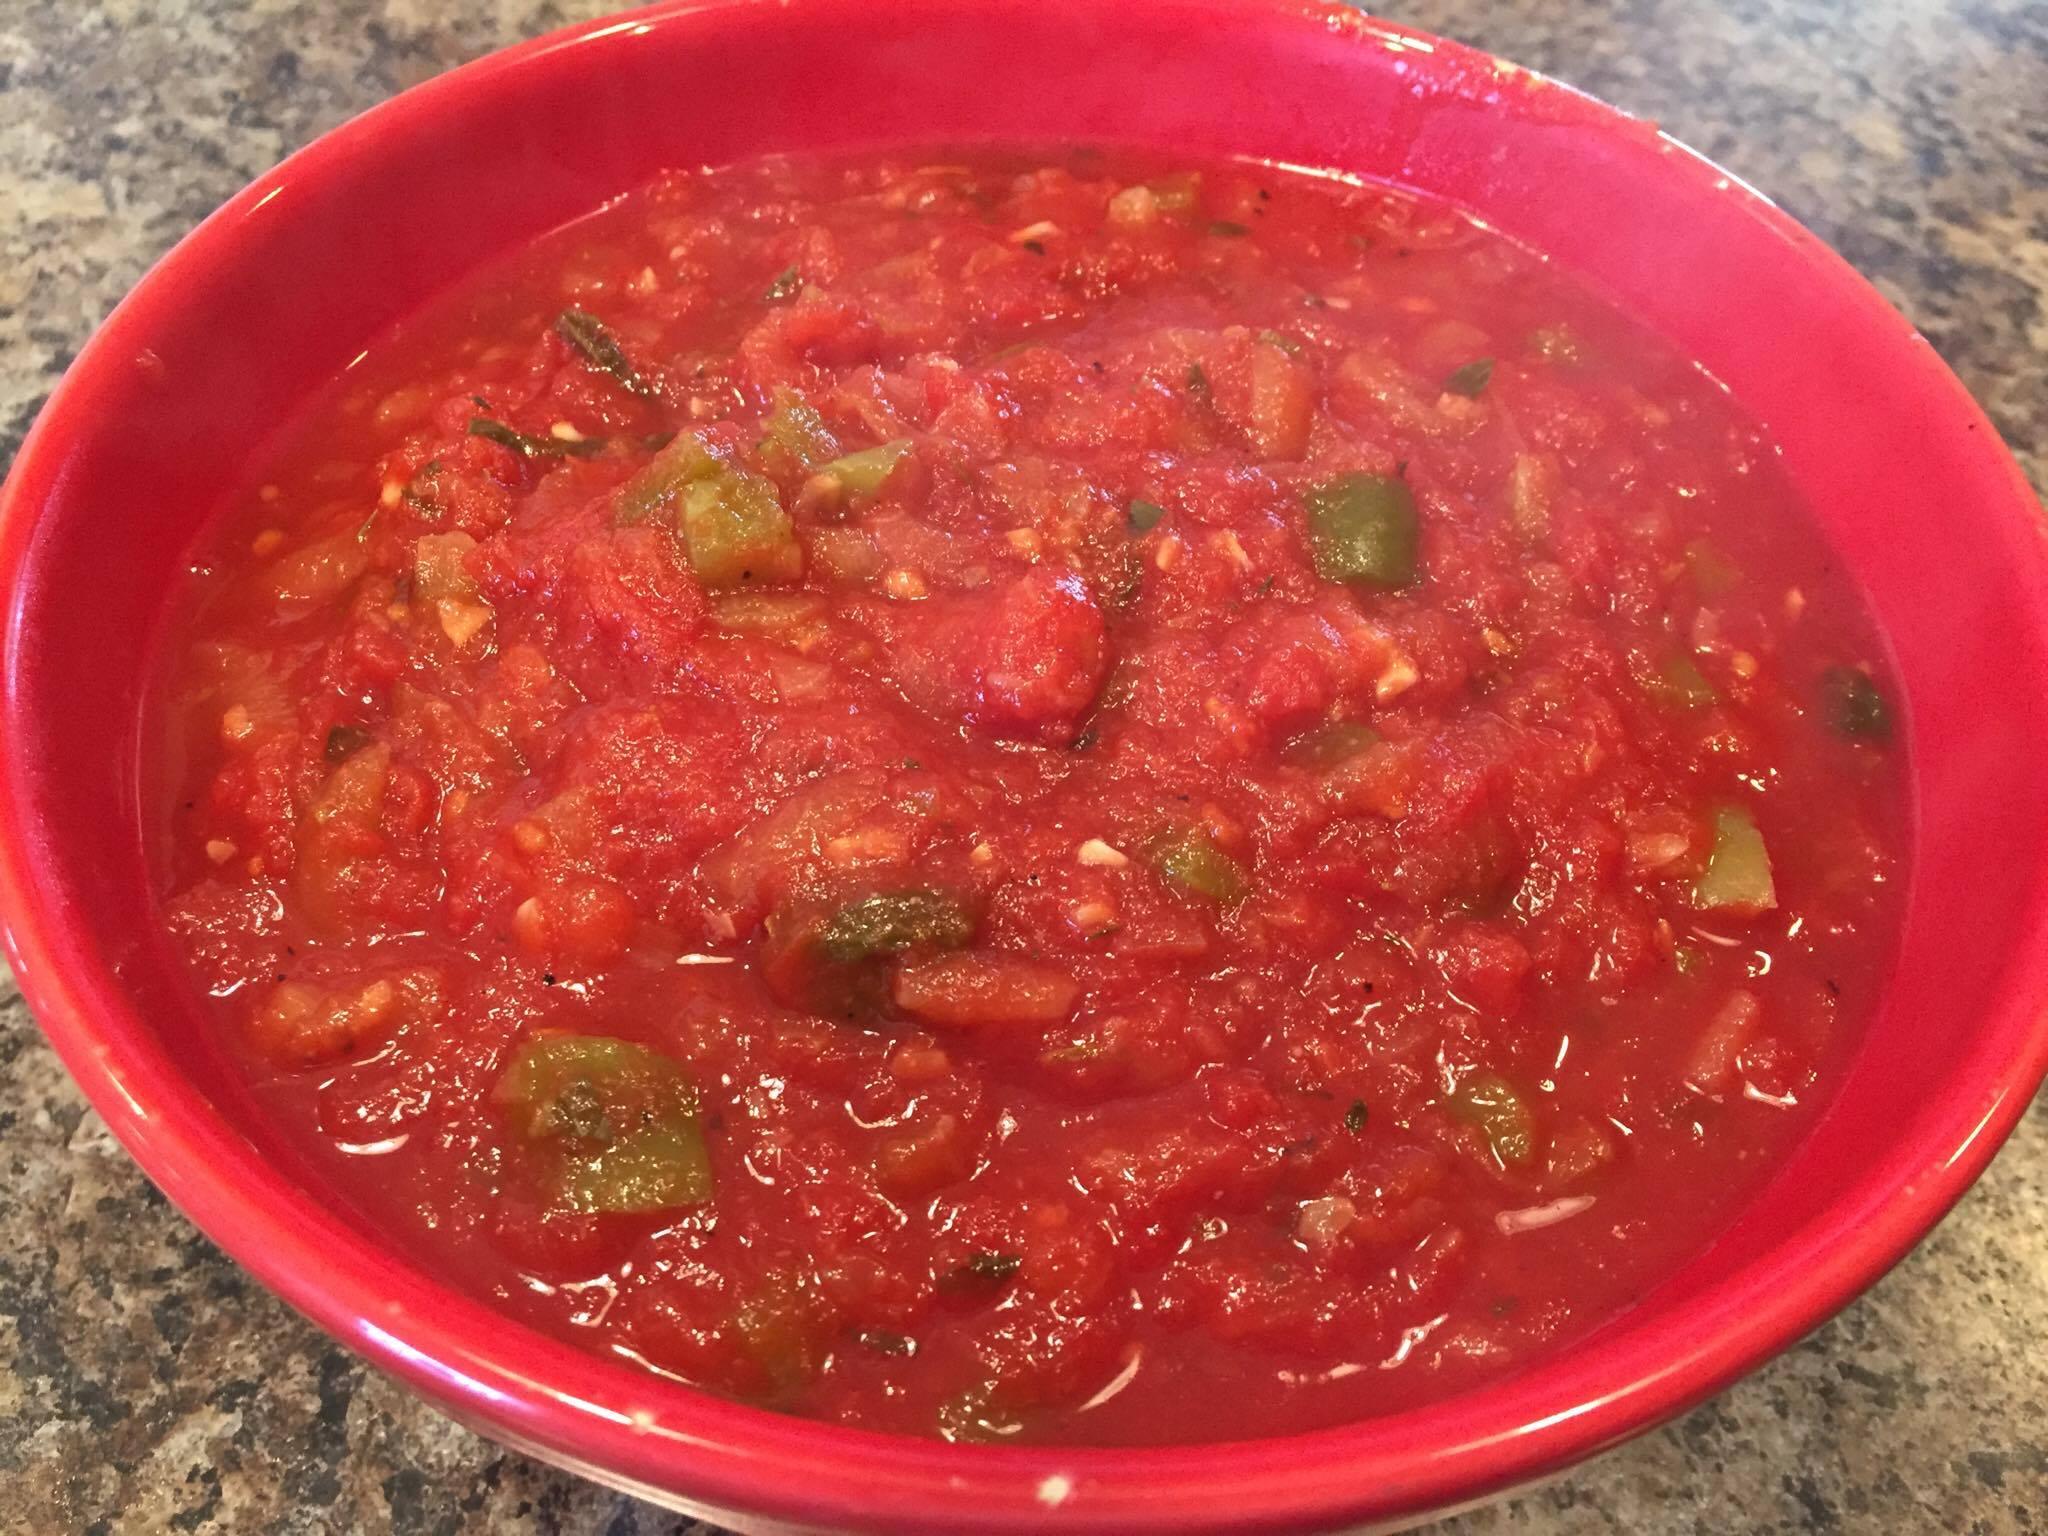 plant-smart-living-hearty-vegetable-spaghetti-sauce-recipe